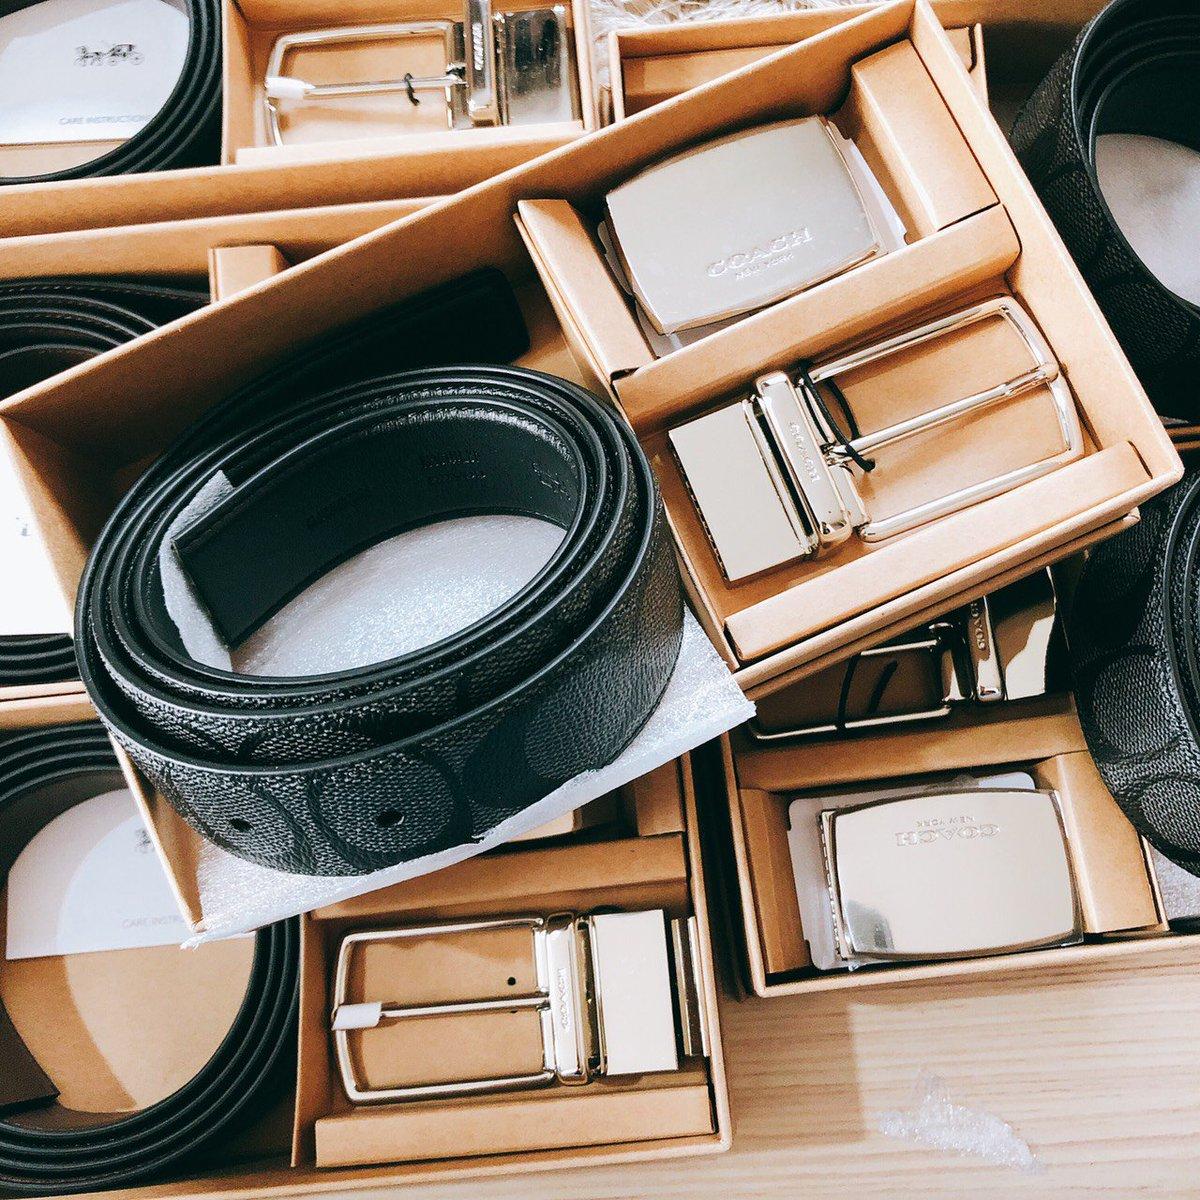 Coach belt set 2990❤#cosmeticsthailand #preorderusa #HowtoPerfect#พรีออเดอร์usa #กระเป๋าแบรนด์เนมแท้ #กระเป๋าcoach #coachthailand  #นาฬิกาแบรนด์เนมแท้ #HowtoBeauty #กระเป๋าพร้อมส่ง #brandnamethailand #ตลาดนัดสวนแครอท